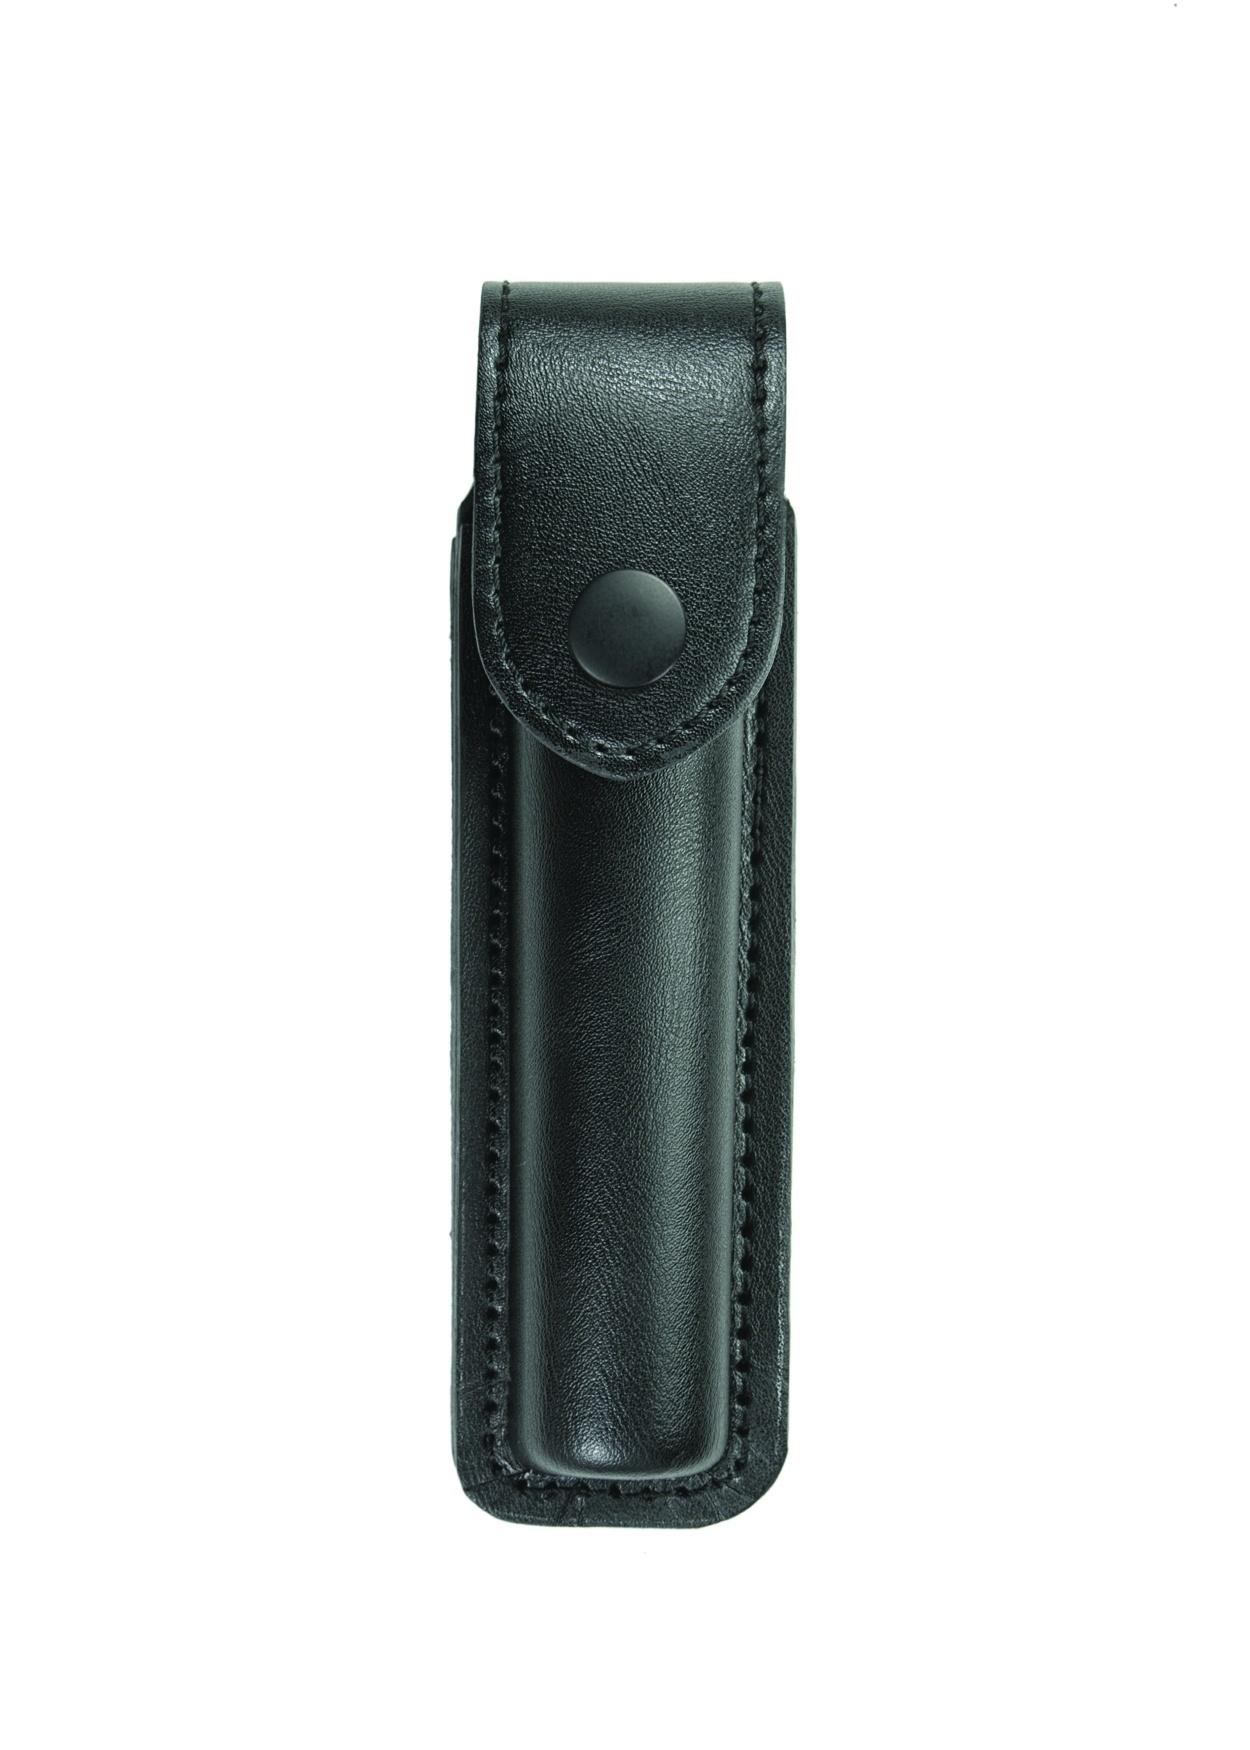 Flashlight Case, Small AA LED, AirTek, Smooth, Black Snap